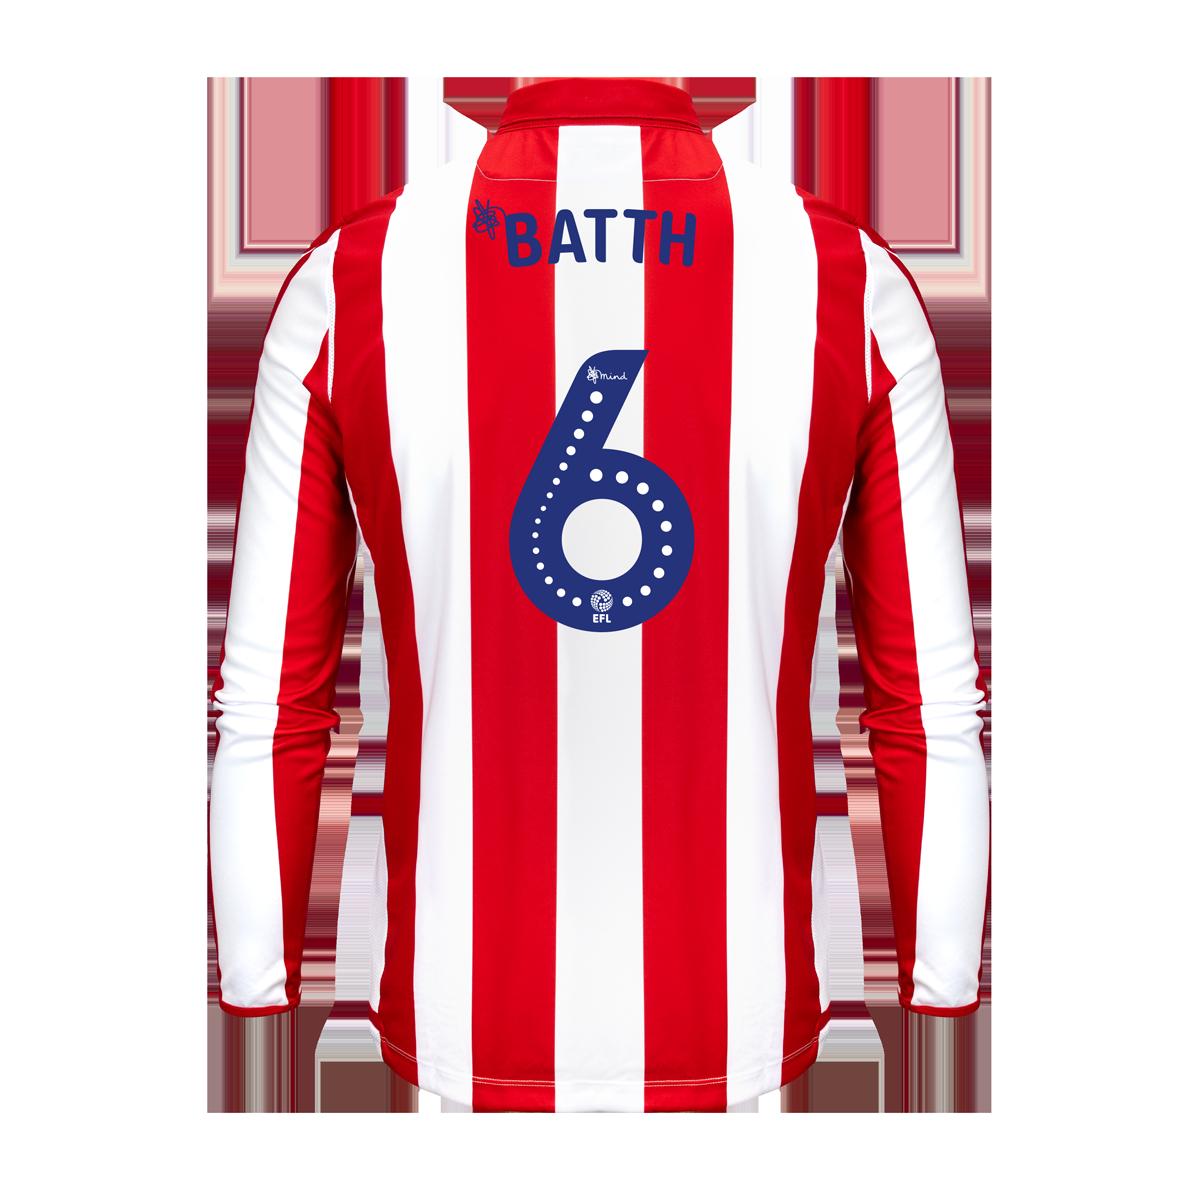 2019/20 Adult Home LS Shirt - Batth